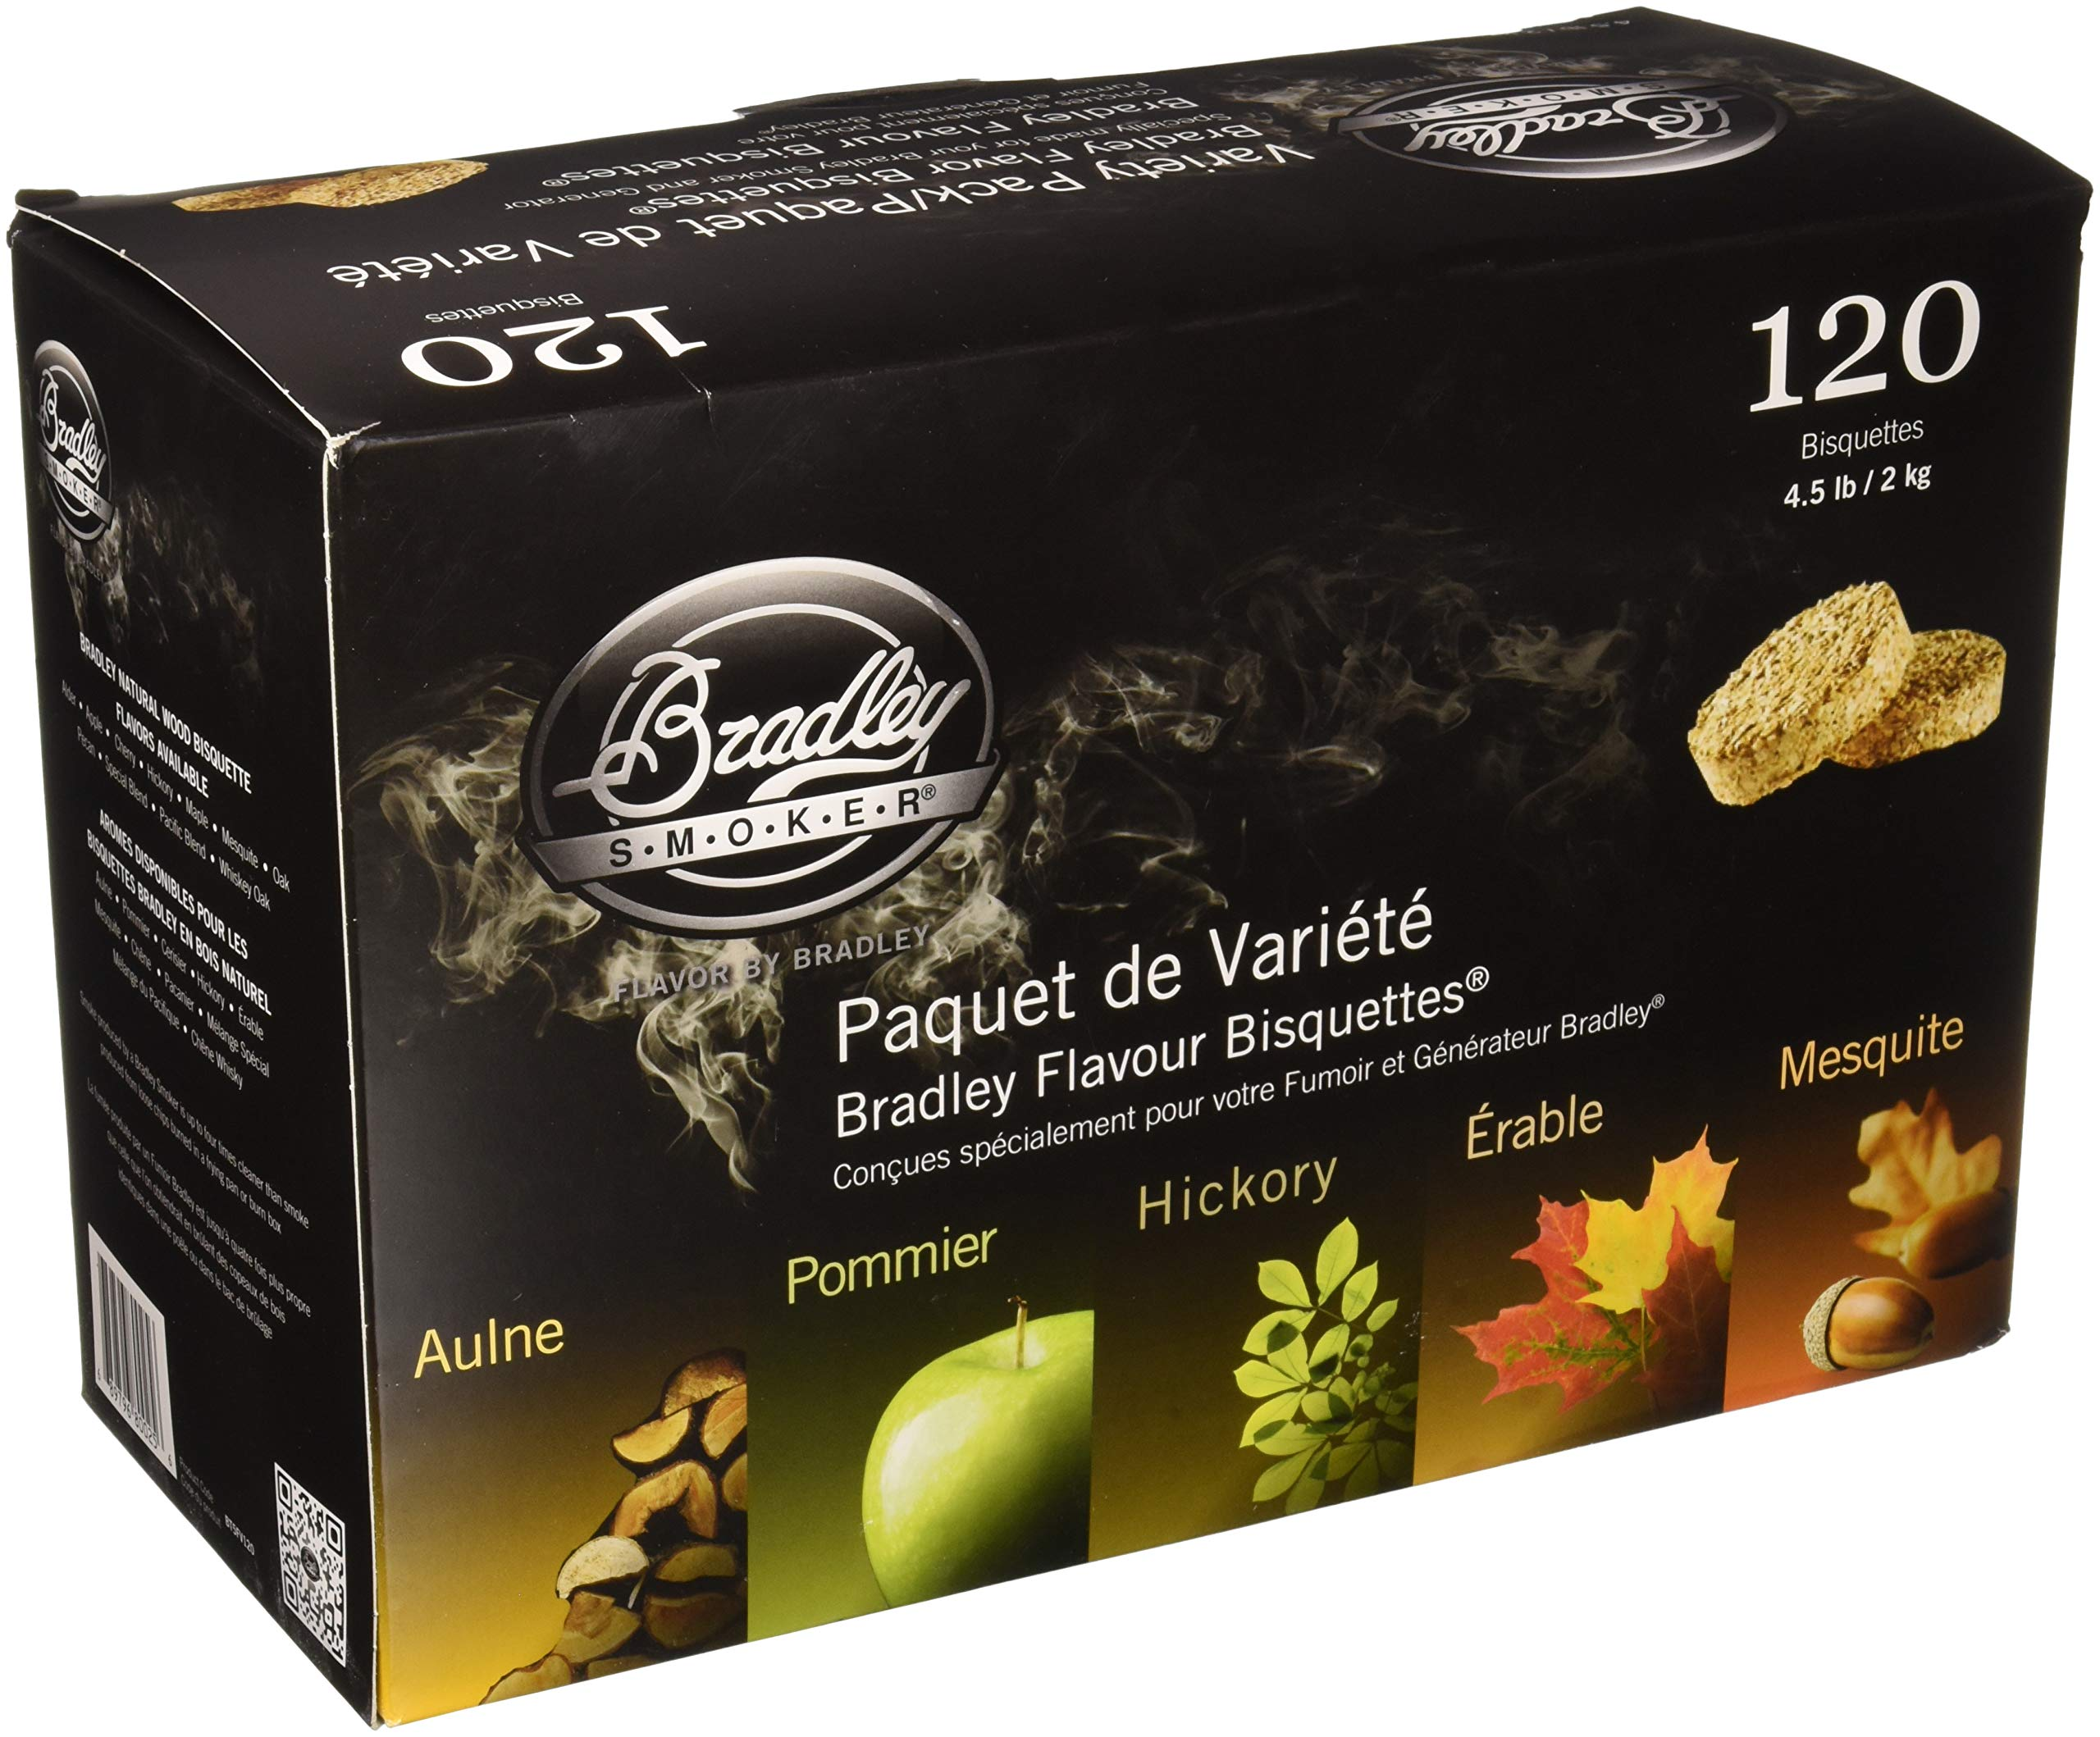 Bradley Technologies Smoker Bisquettes 5 Flavor Variety (120 Pack) by Bradley Smoker